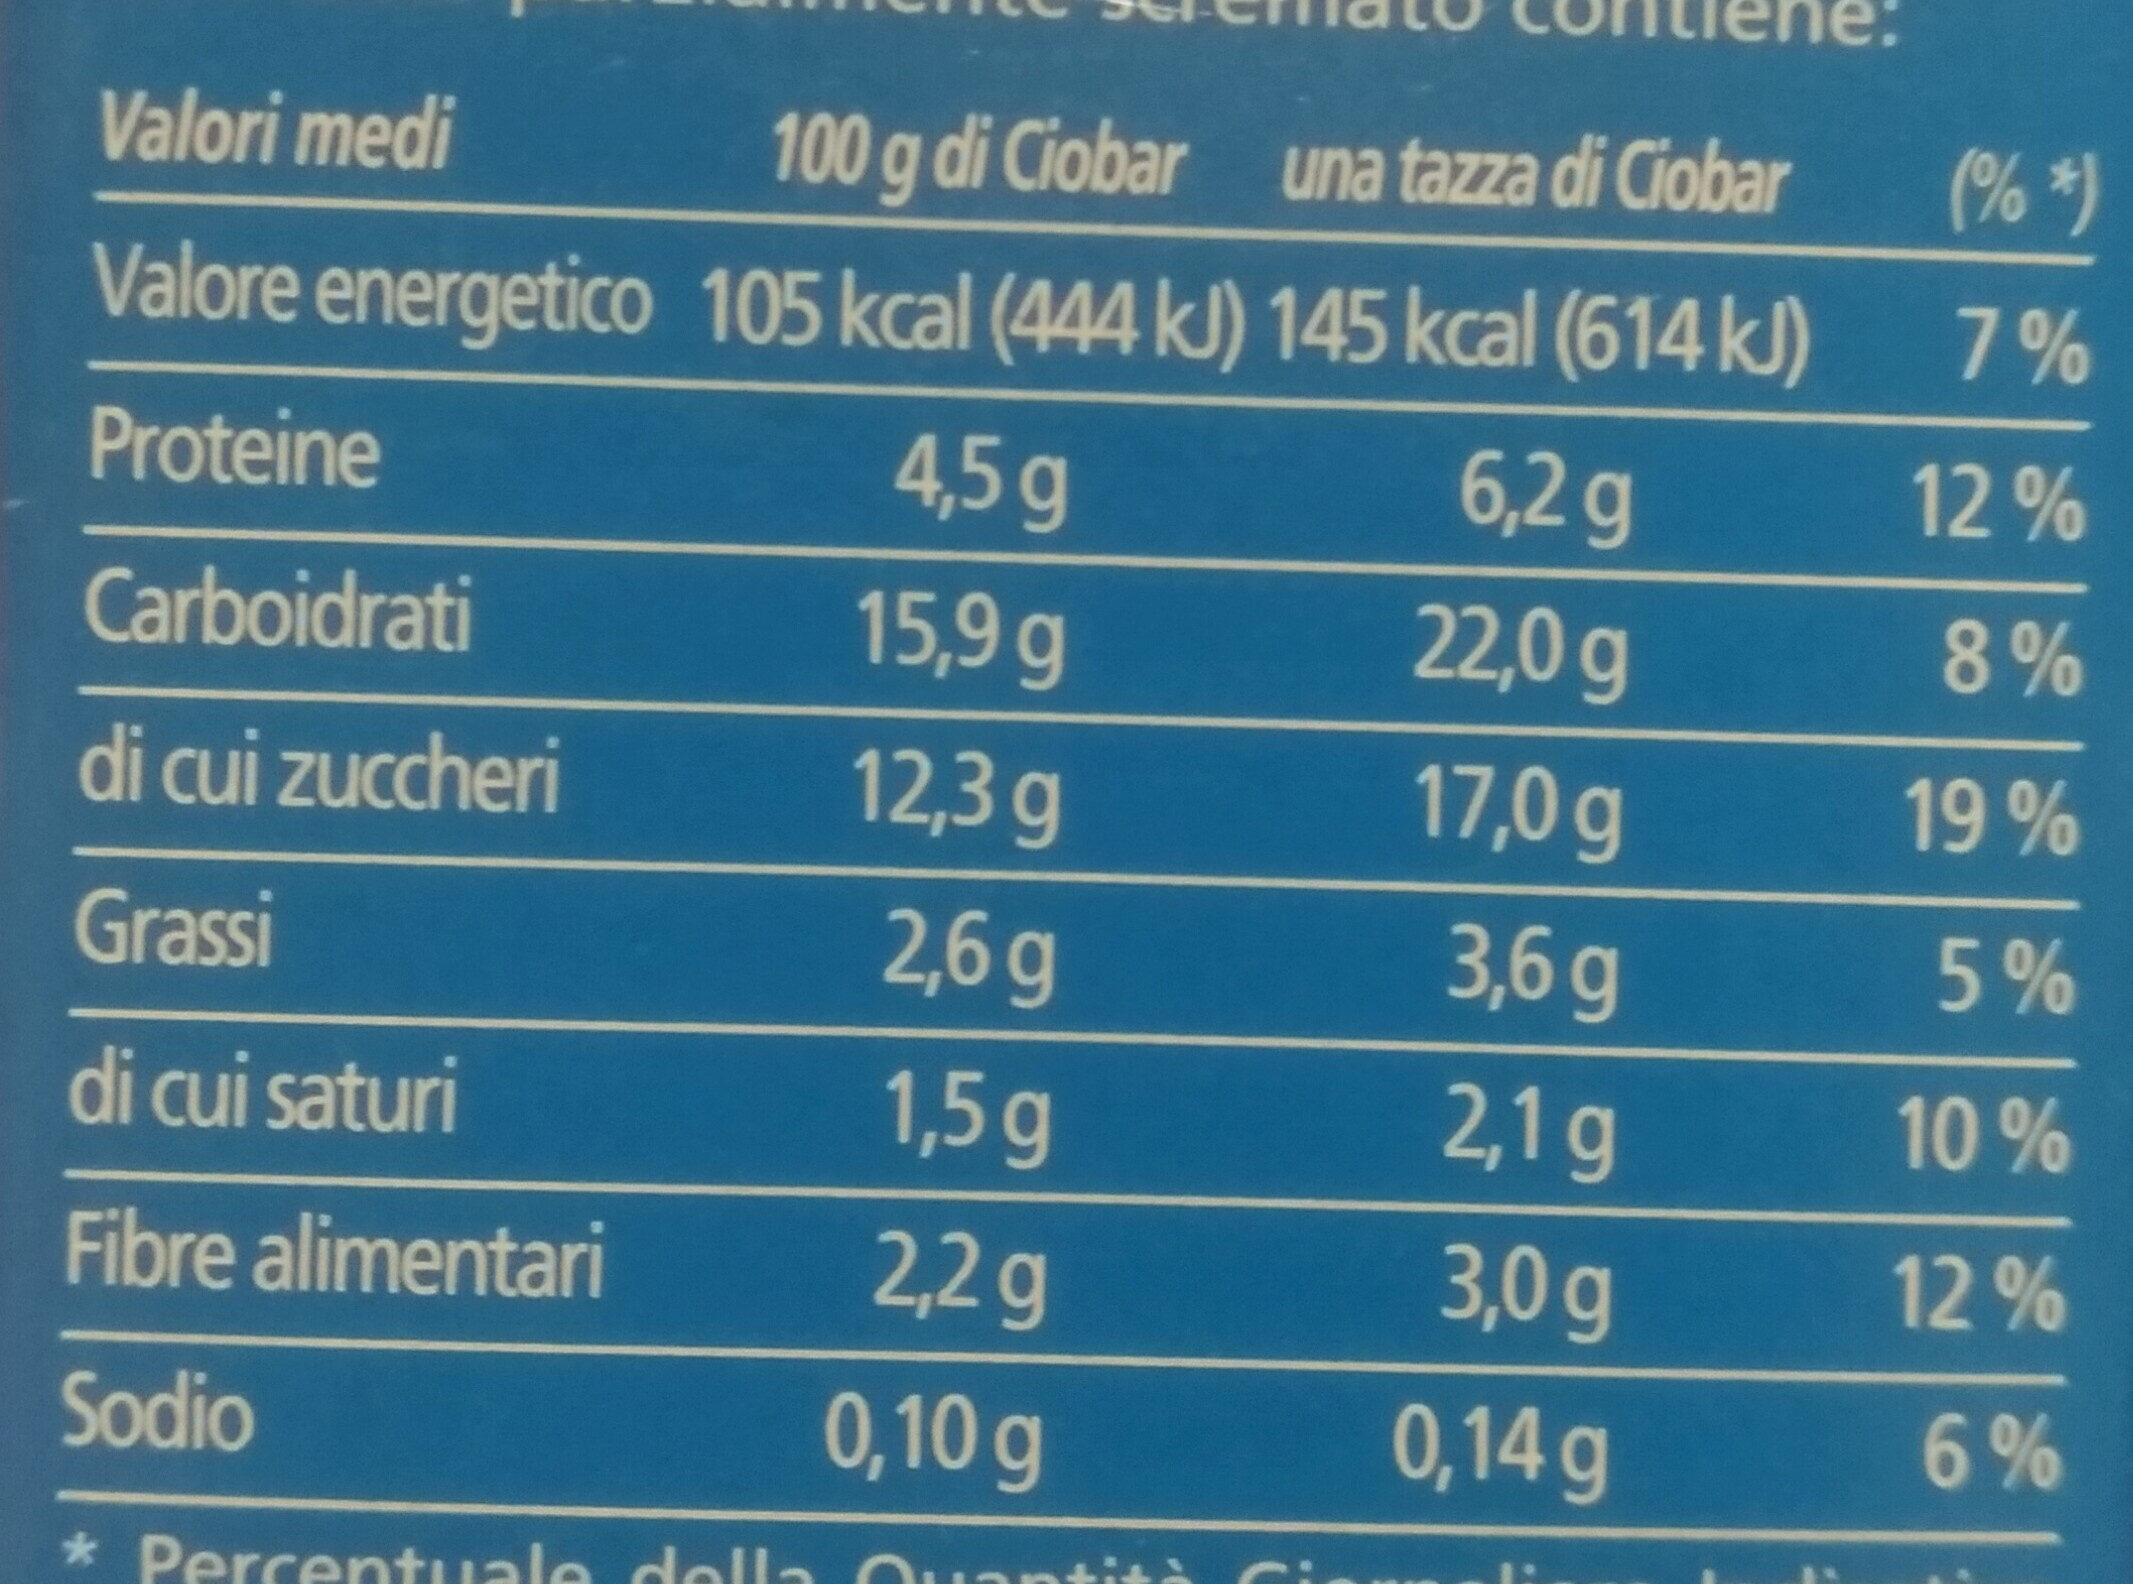 Cameo Ciobar Gusto fondente - Nutrition facts - it